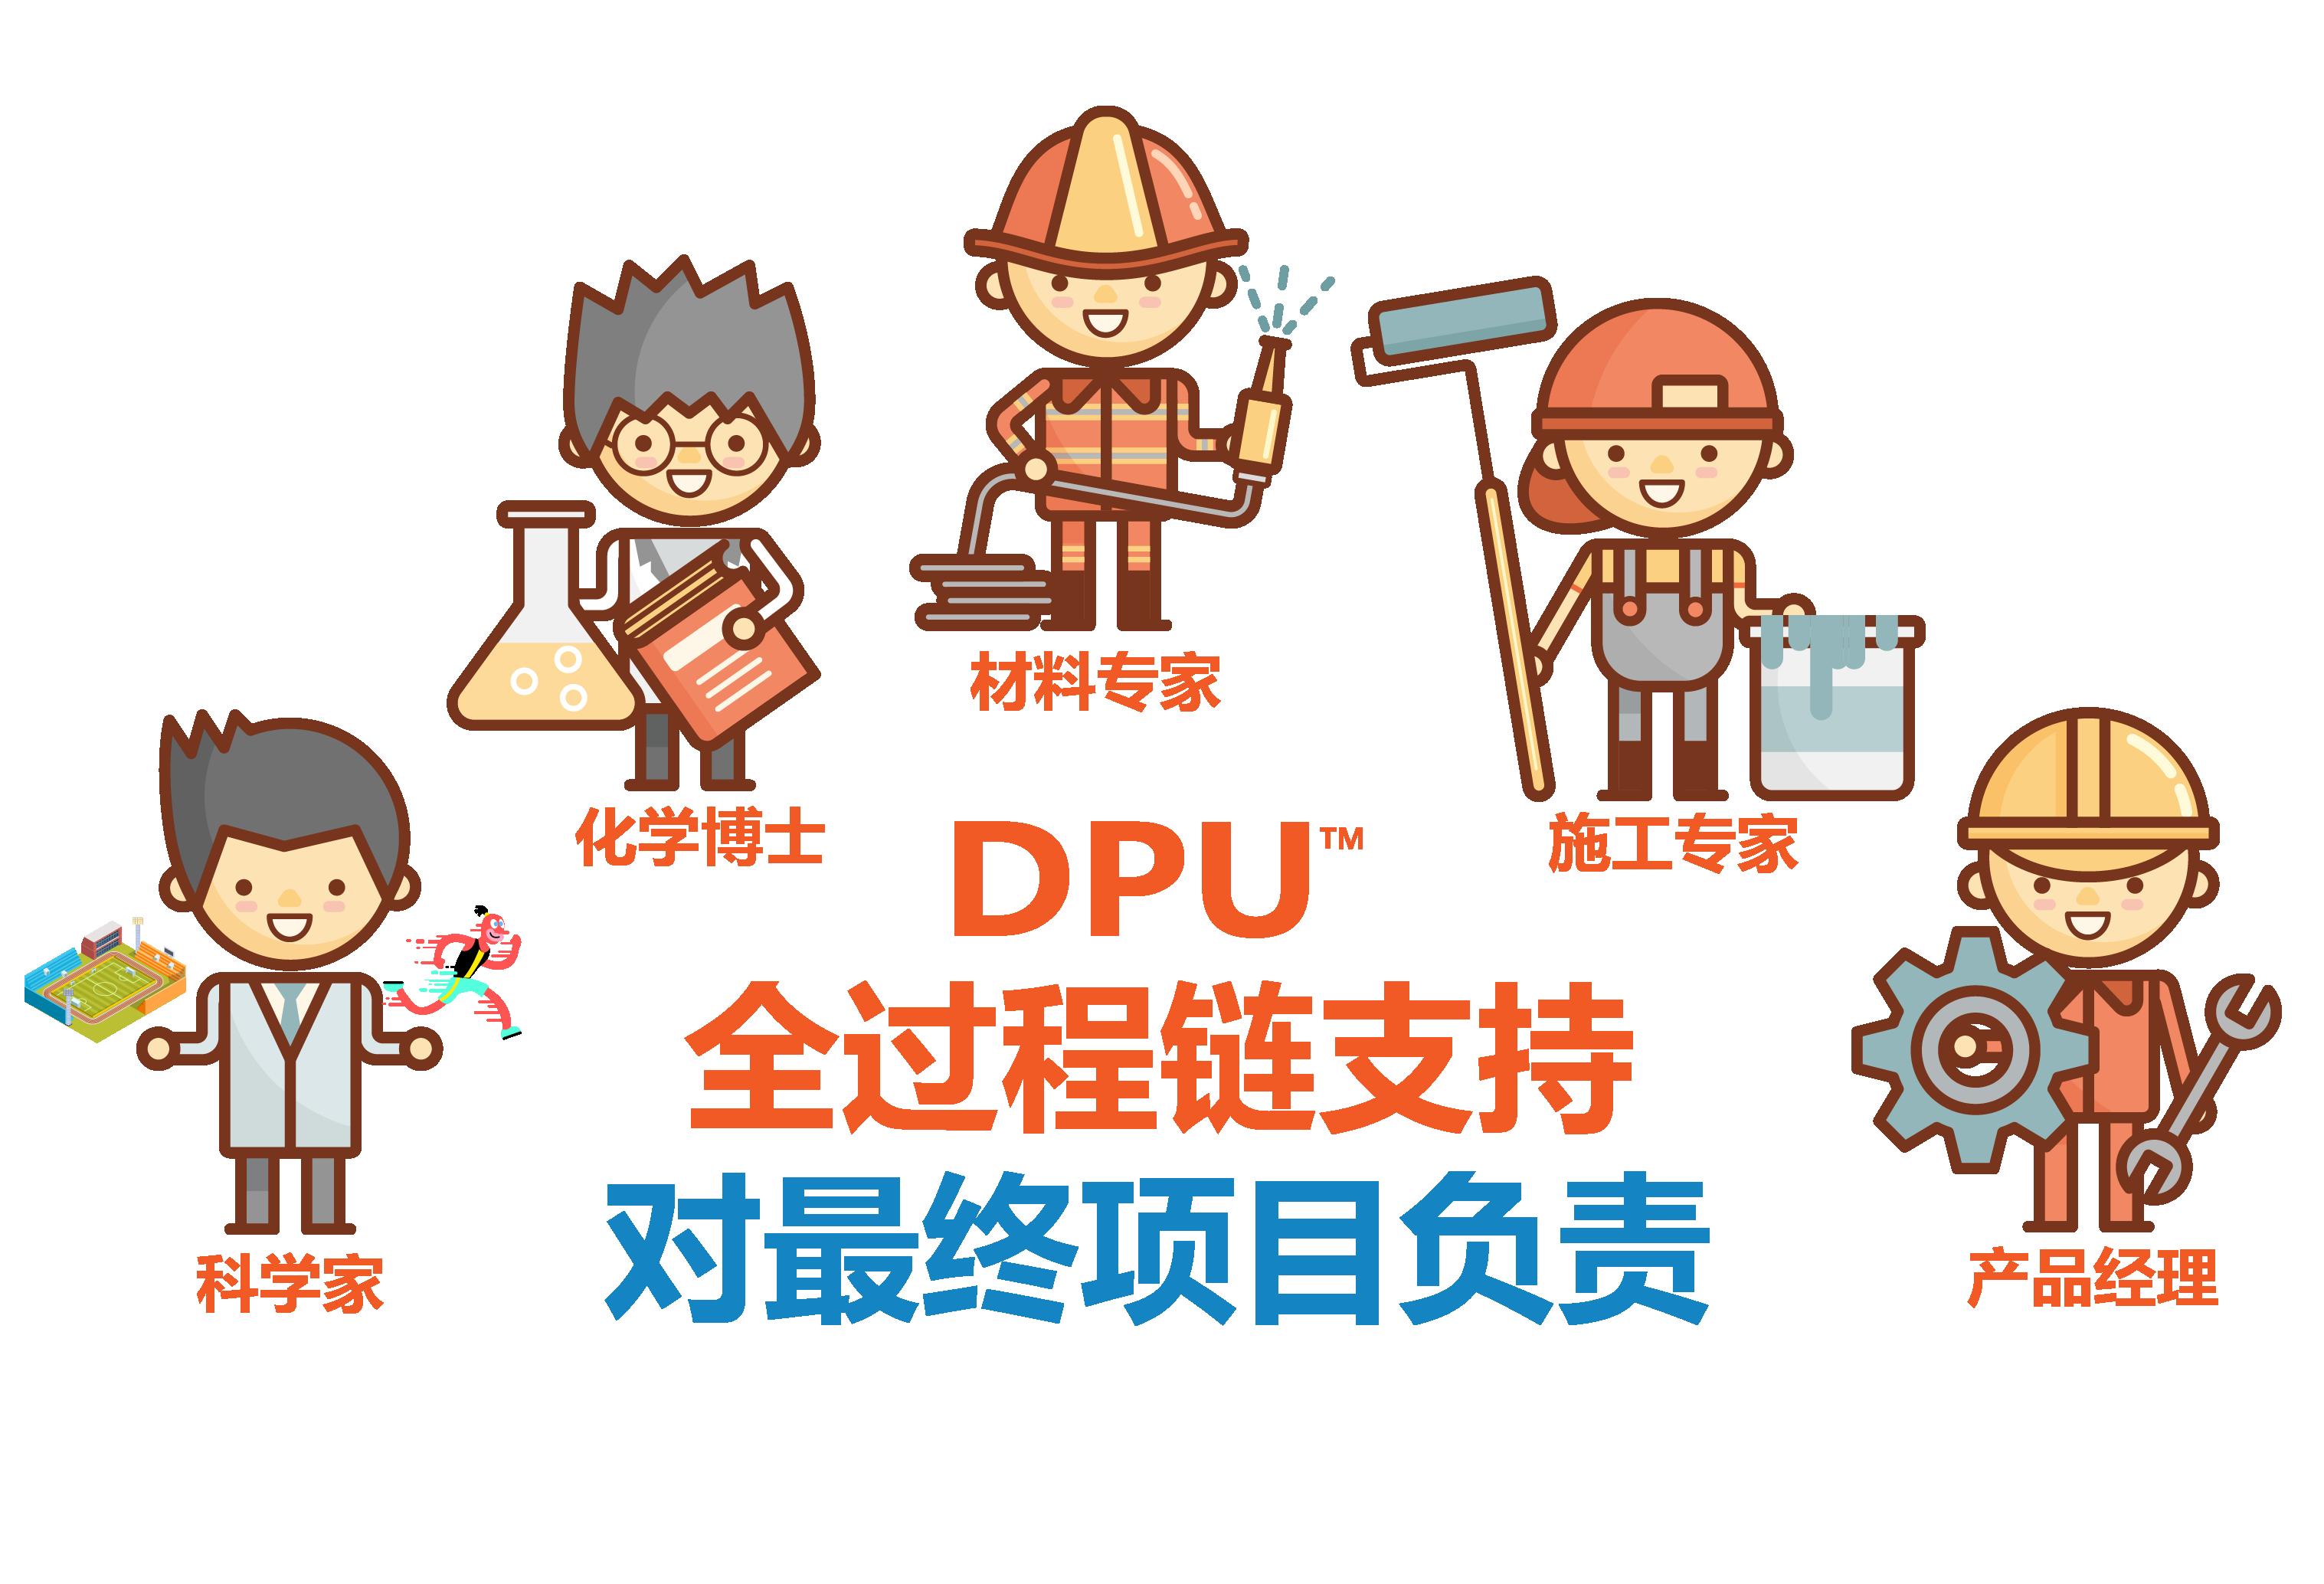 DPU全过程链